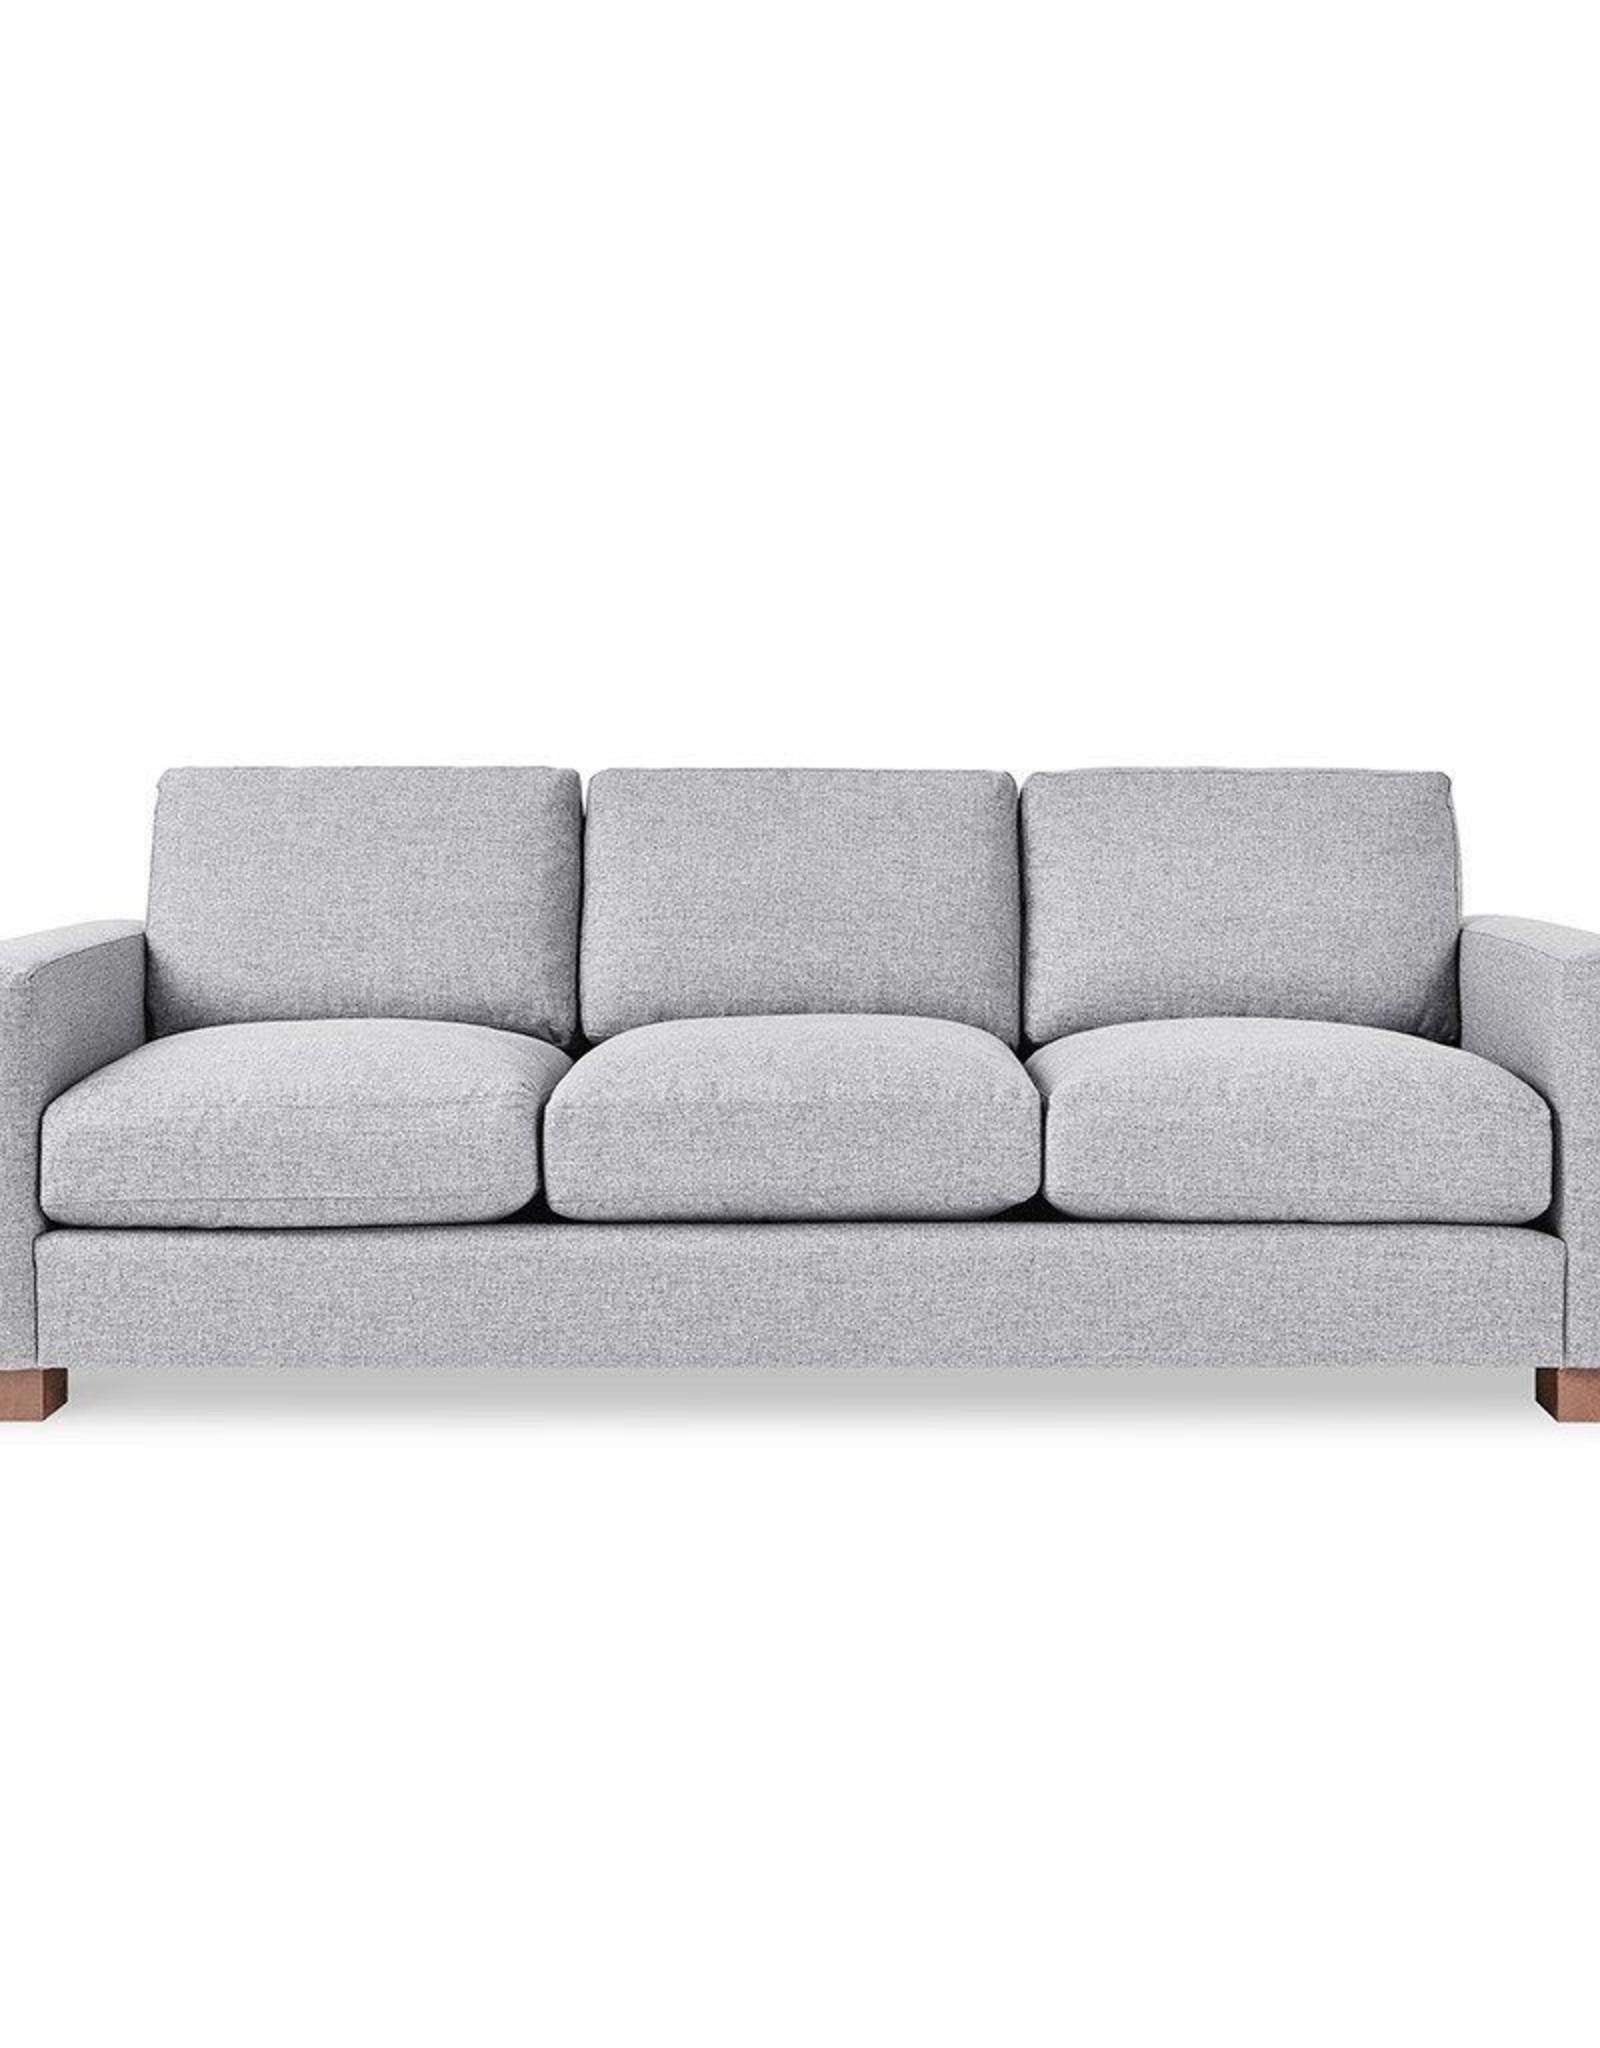 Gus* Modern Parkdale Sofa